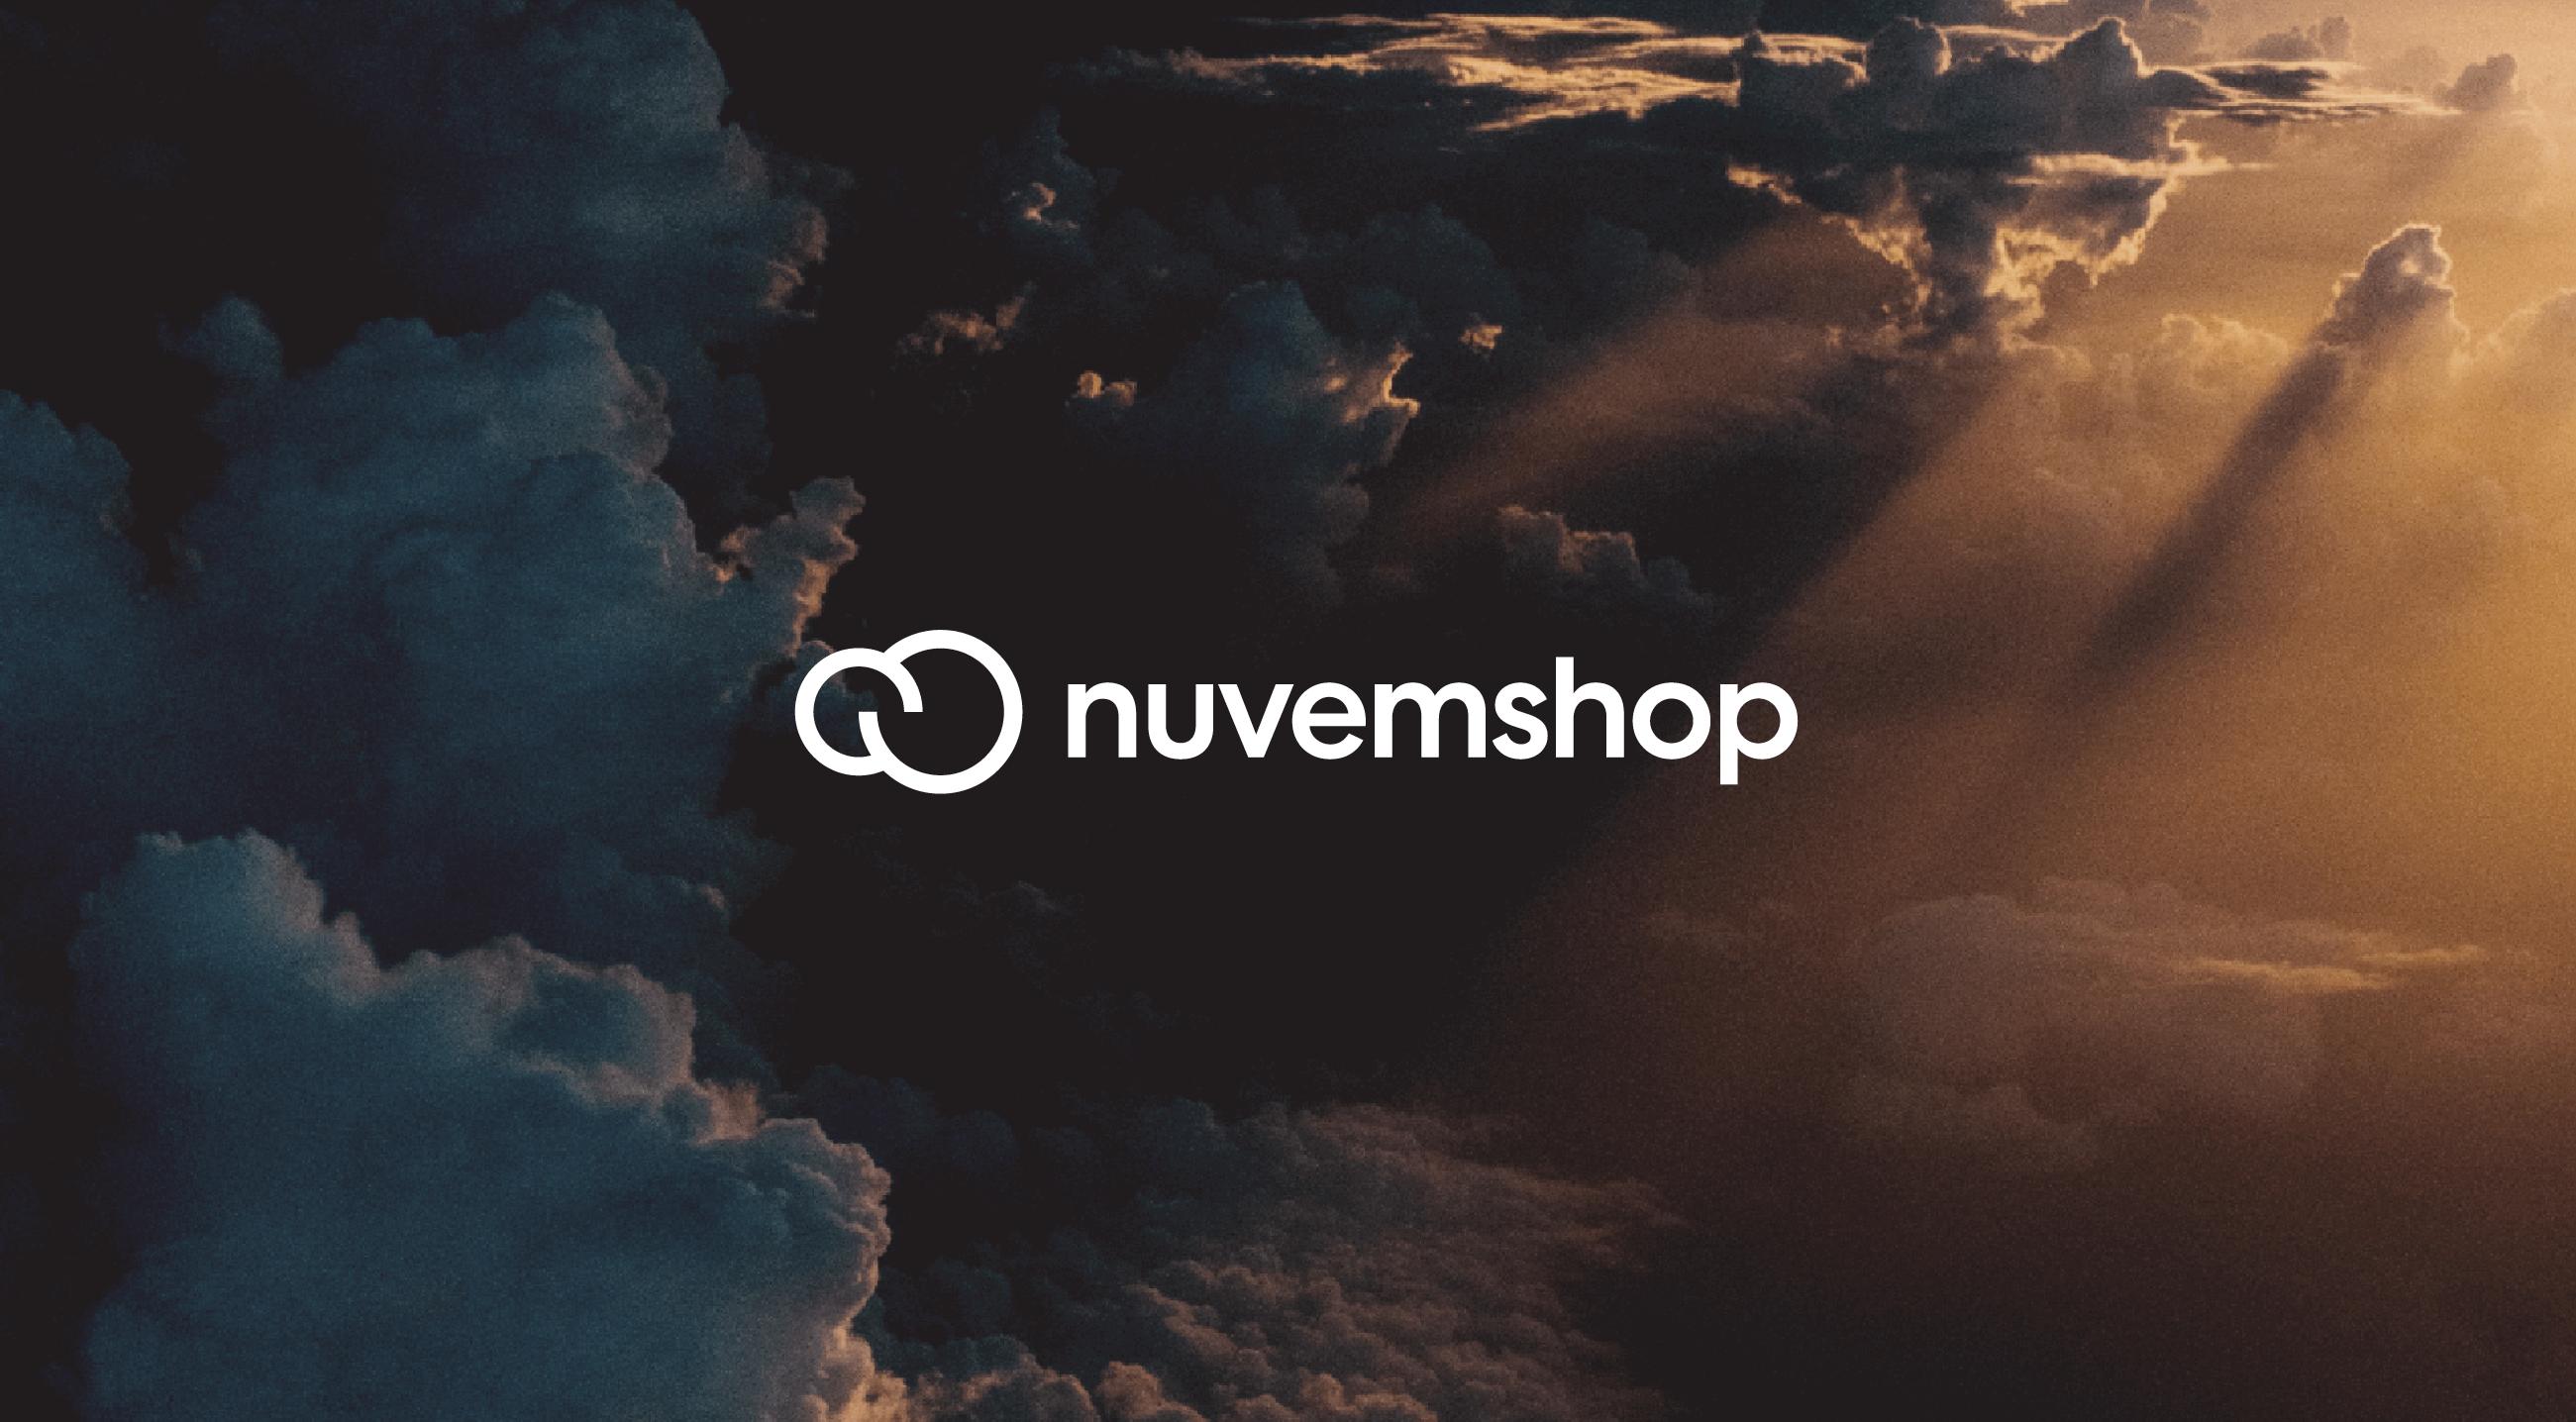 novo logo nuvemshop